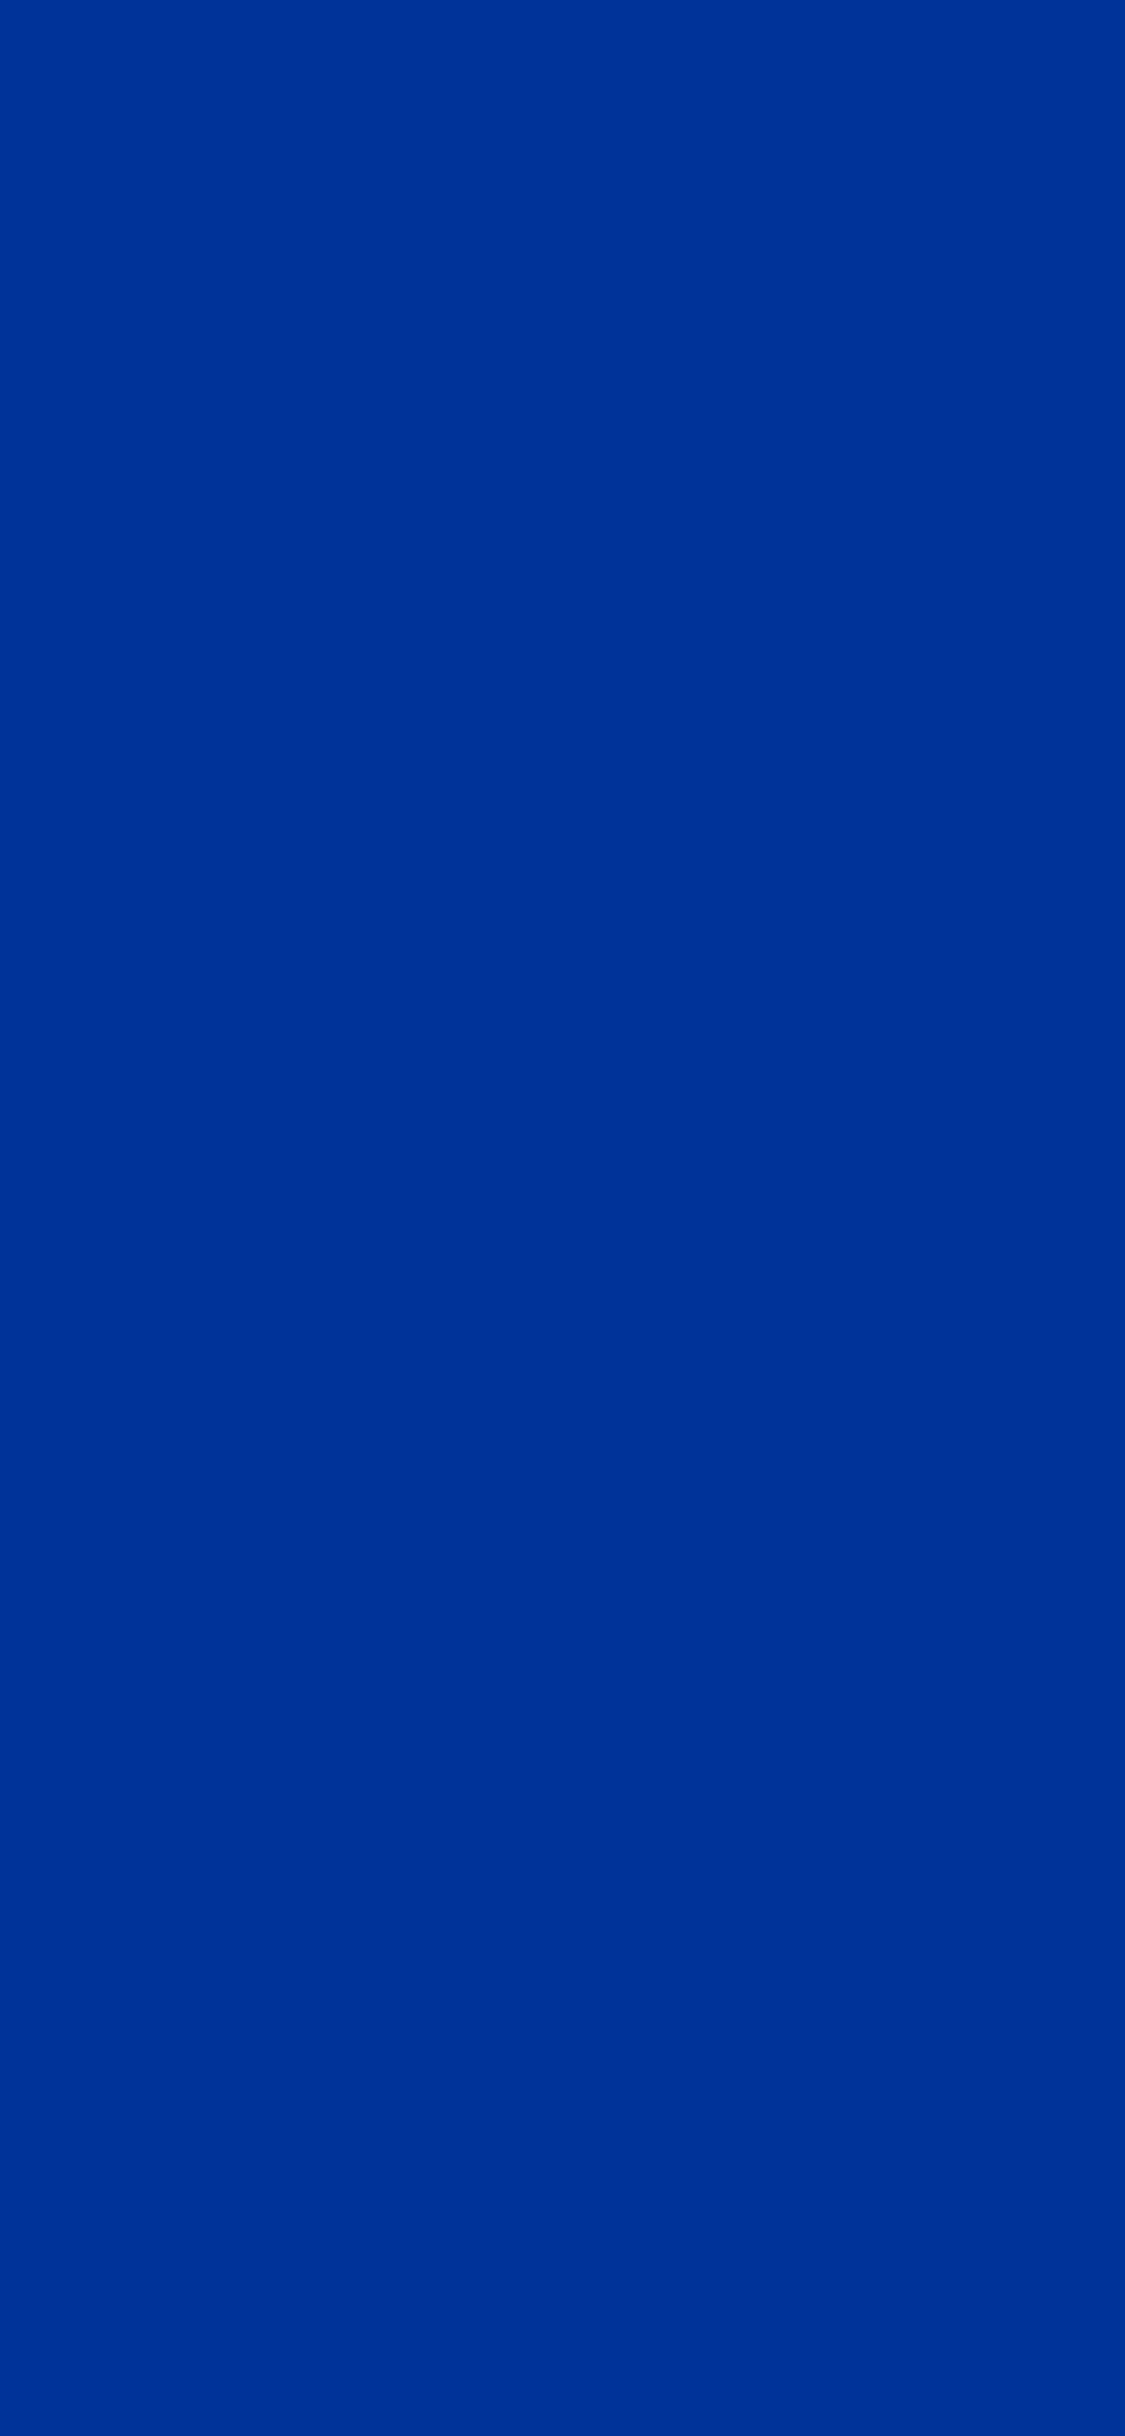 1125x2436 Dark Powder Blue Solid Color Background